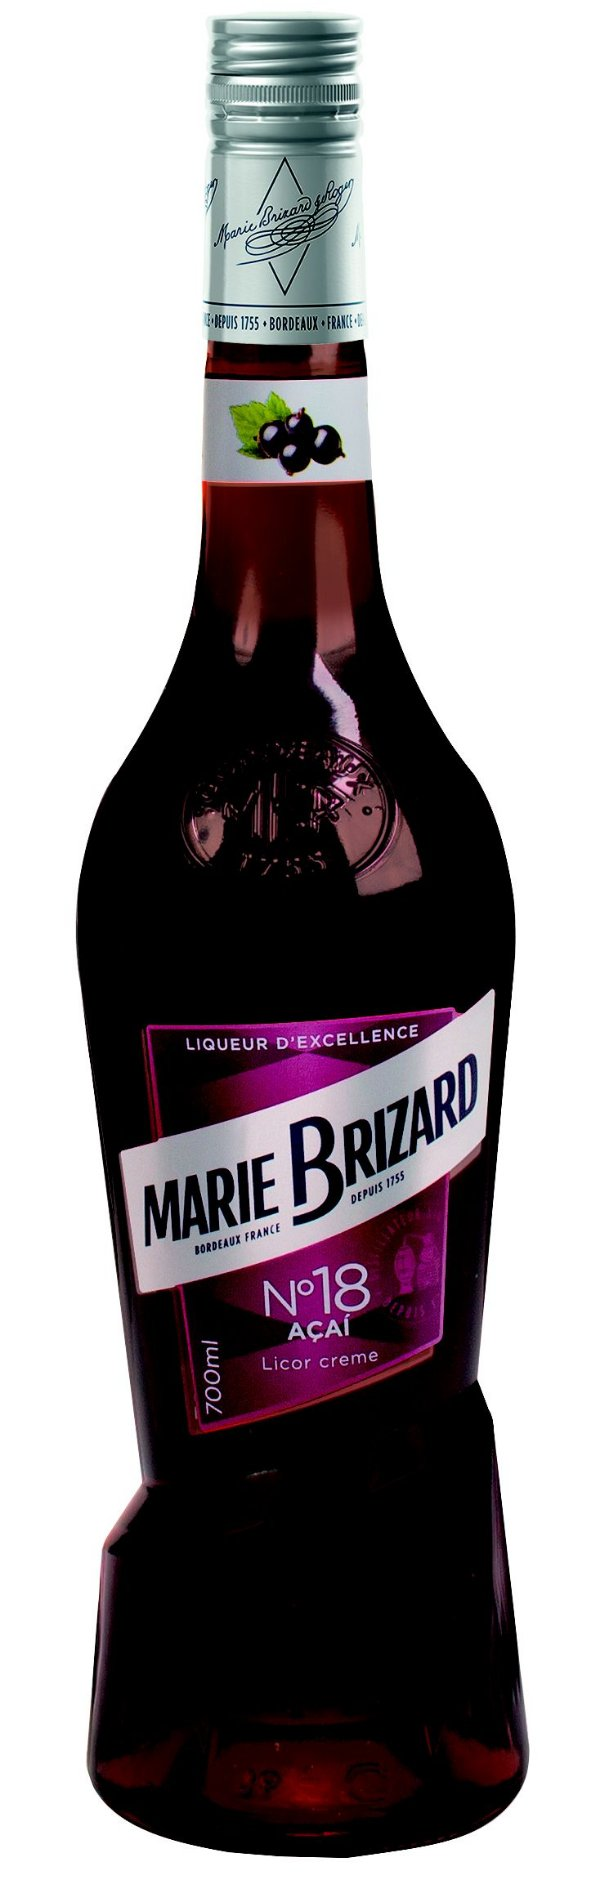 MARIE BRIZARD AÇAI 700ML